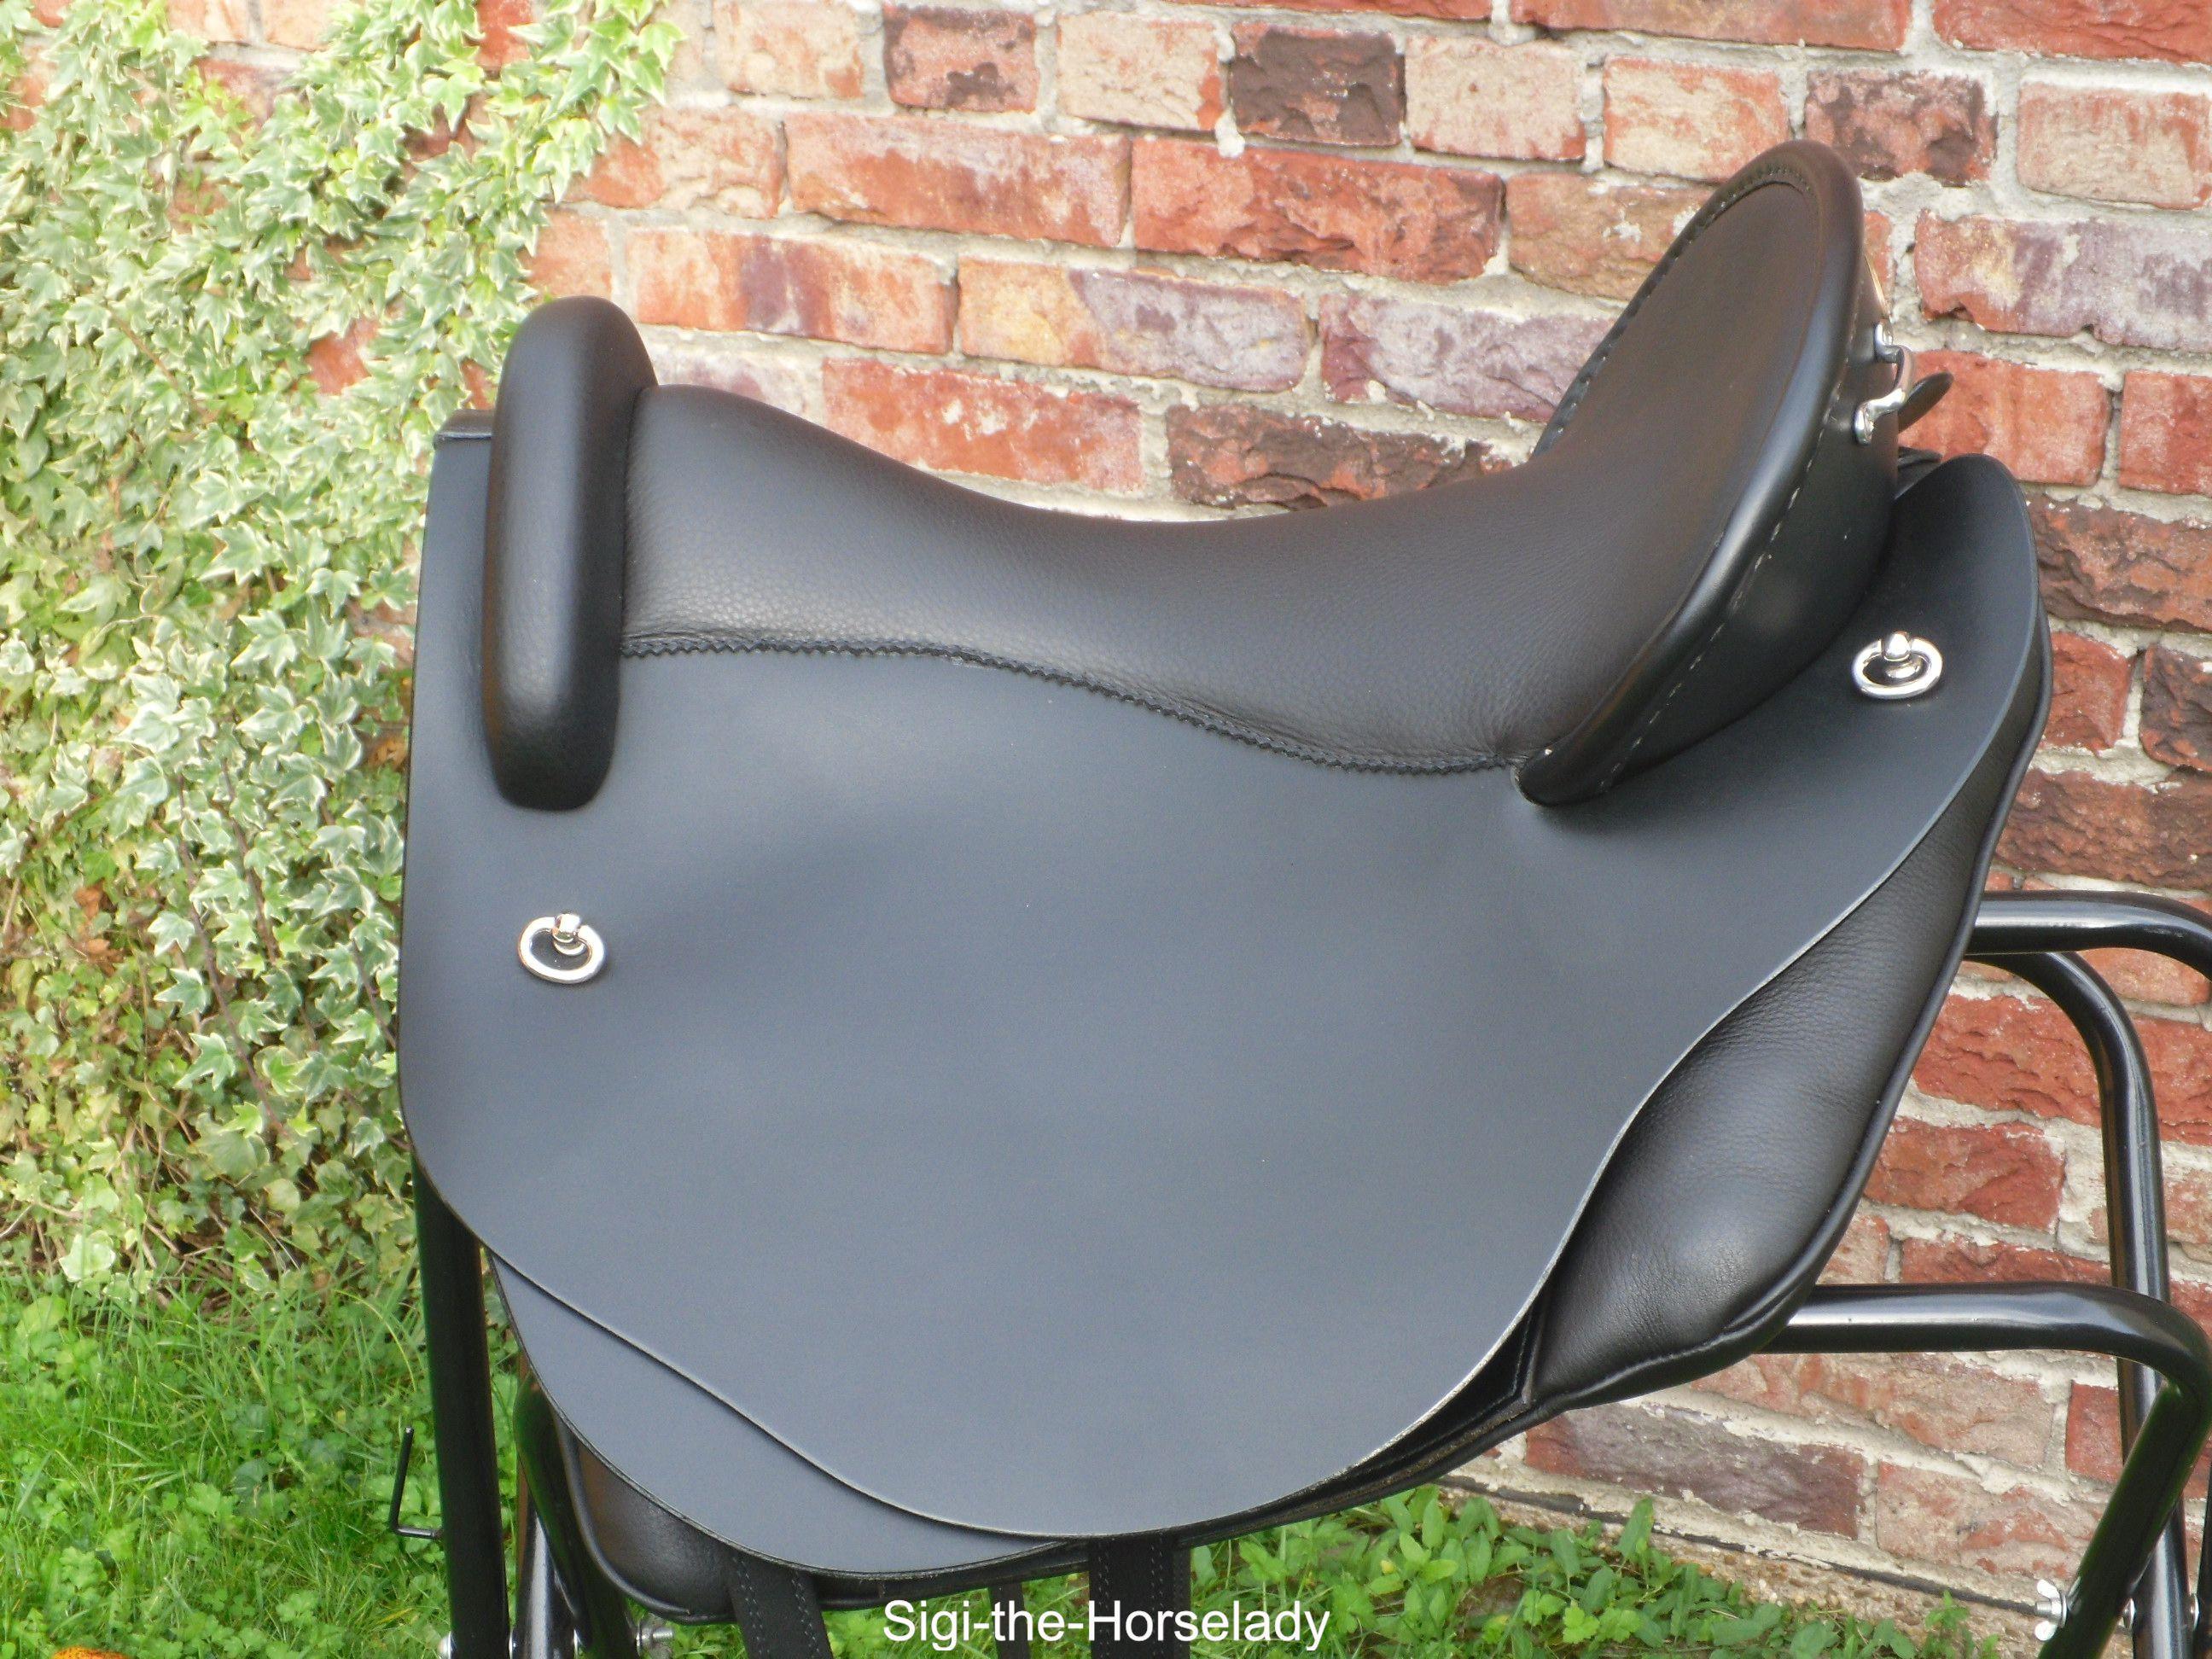 Quantum Ultra Flex Deuber & Partner schwarz S 2 VSK wahlweise Blatt oder Fender